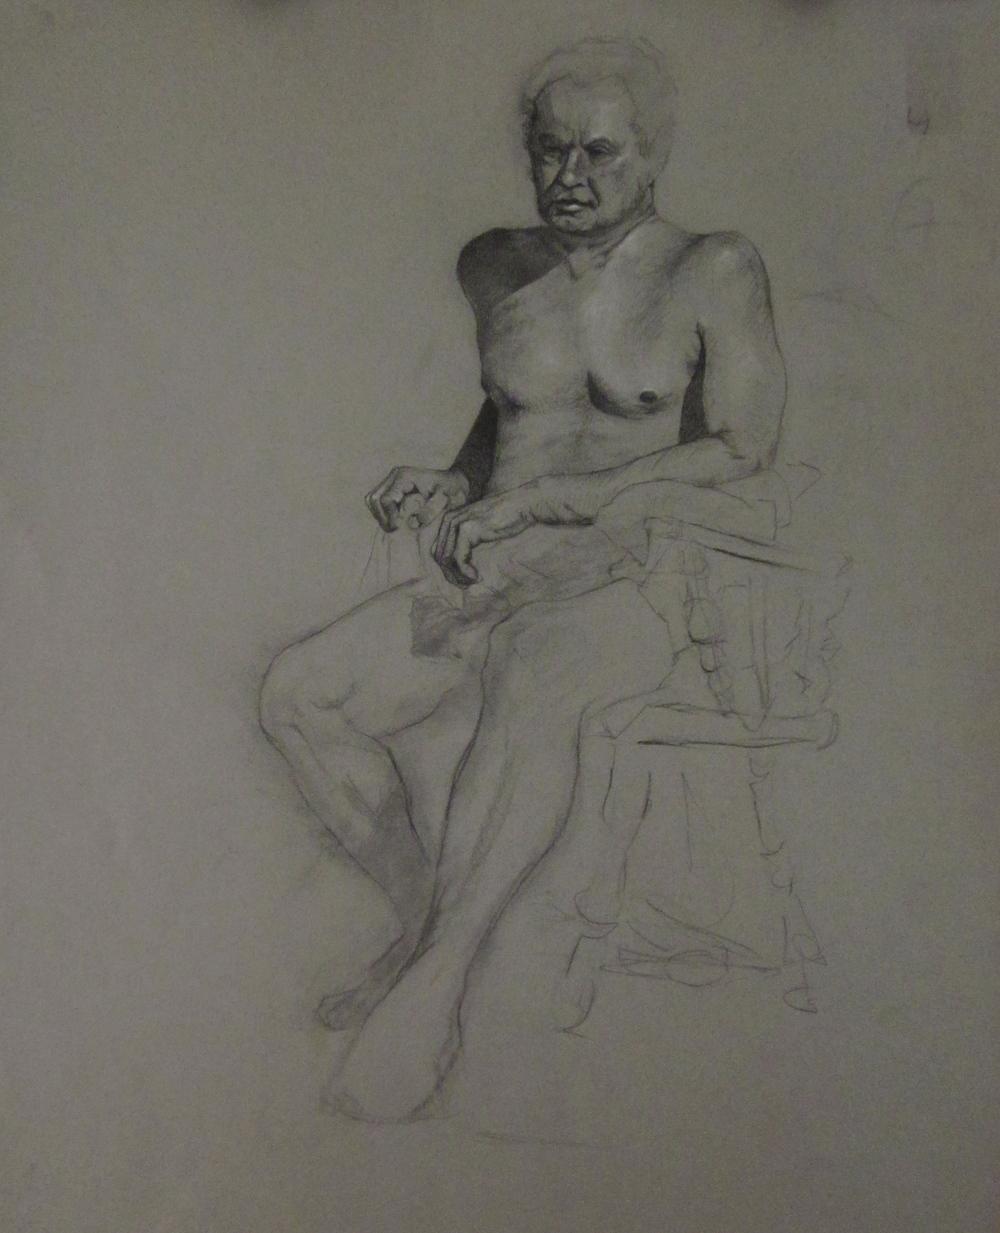 Rex Study 24x18, 2011